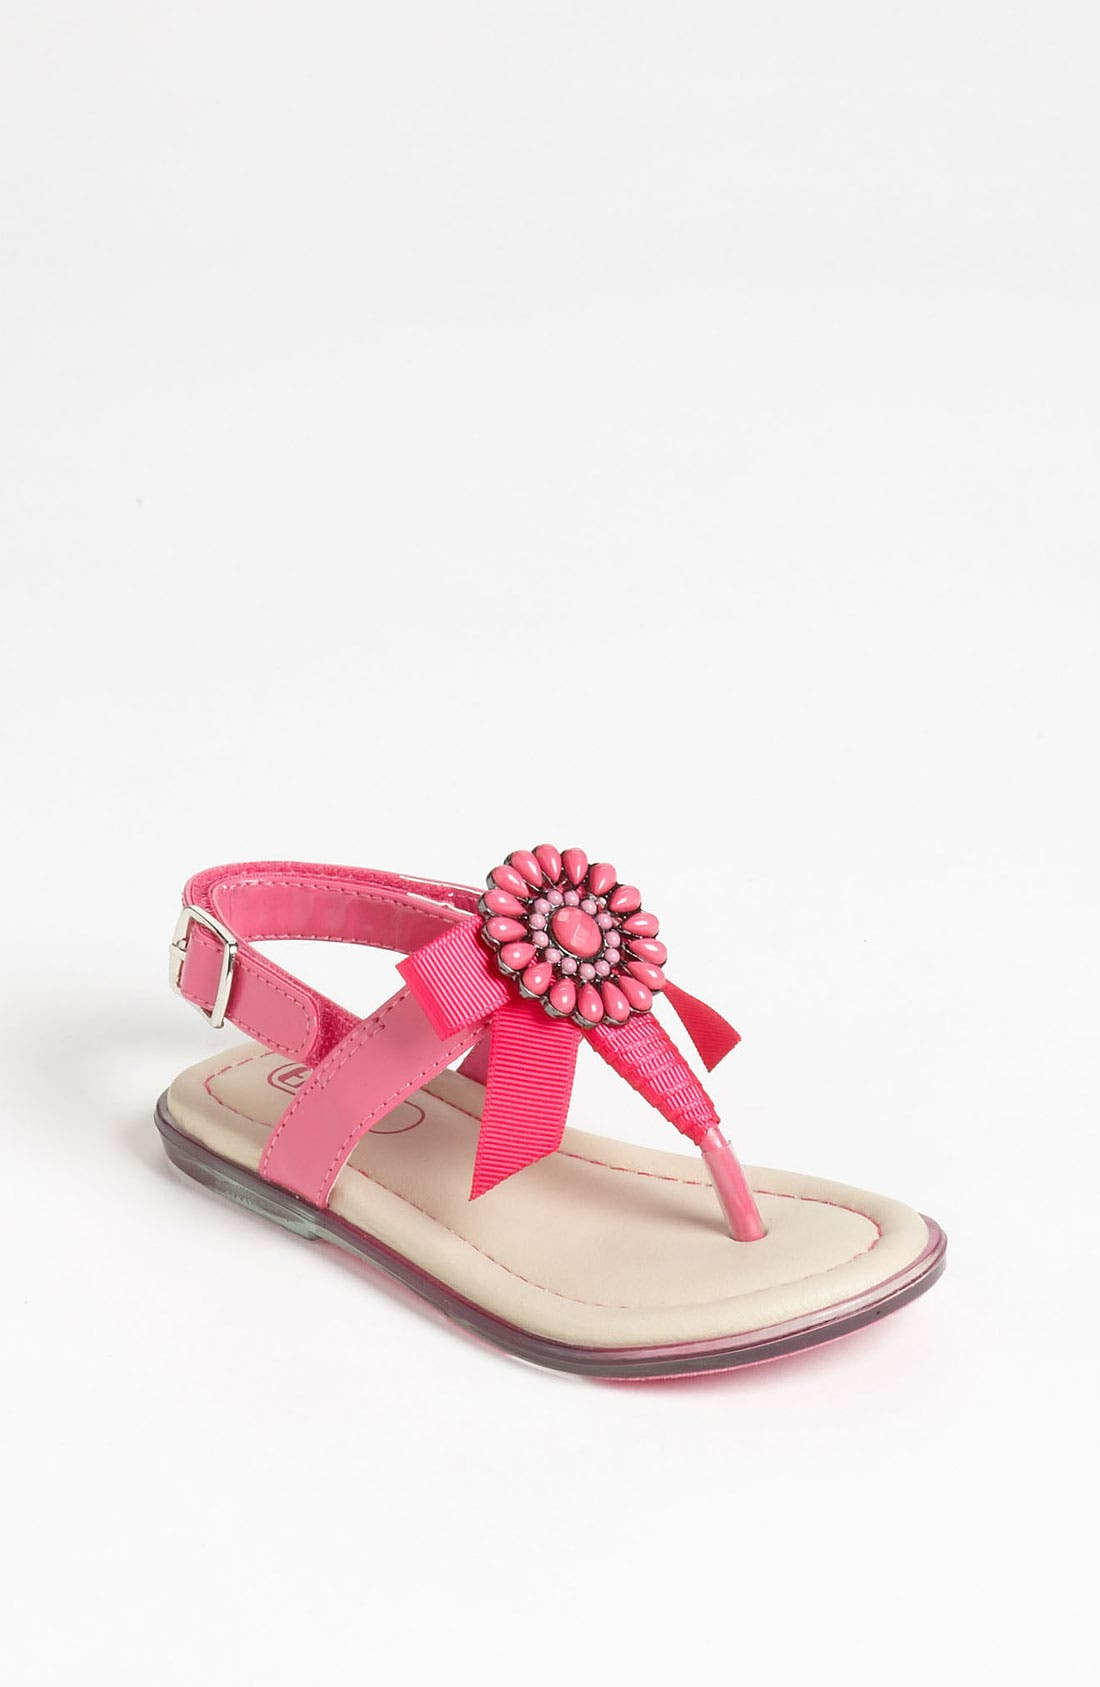 Main Image - Enzo 'Kristina' Bow Sandal (Toddler)